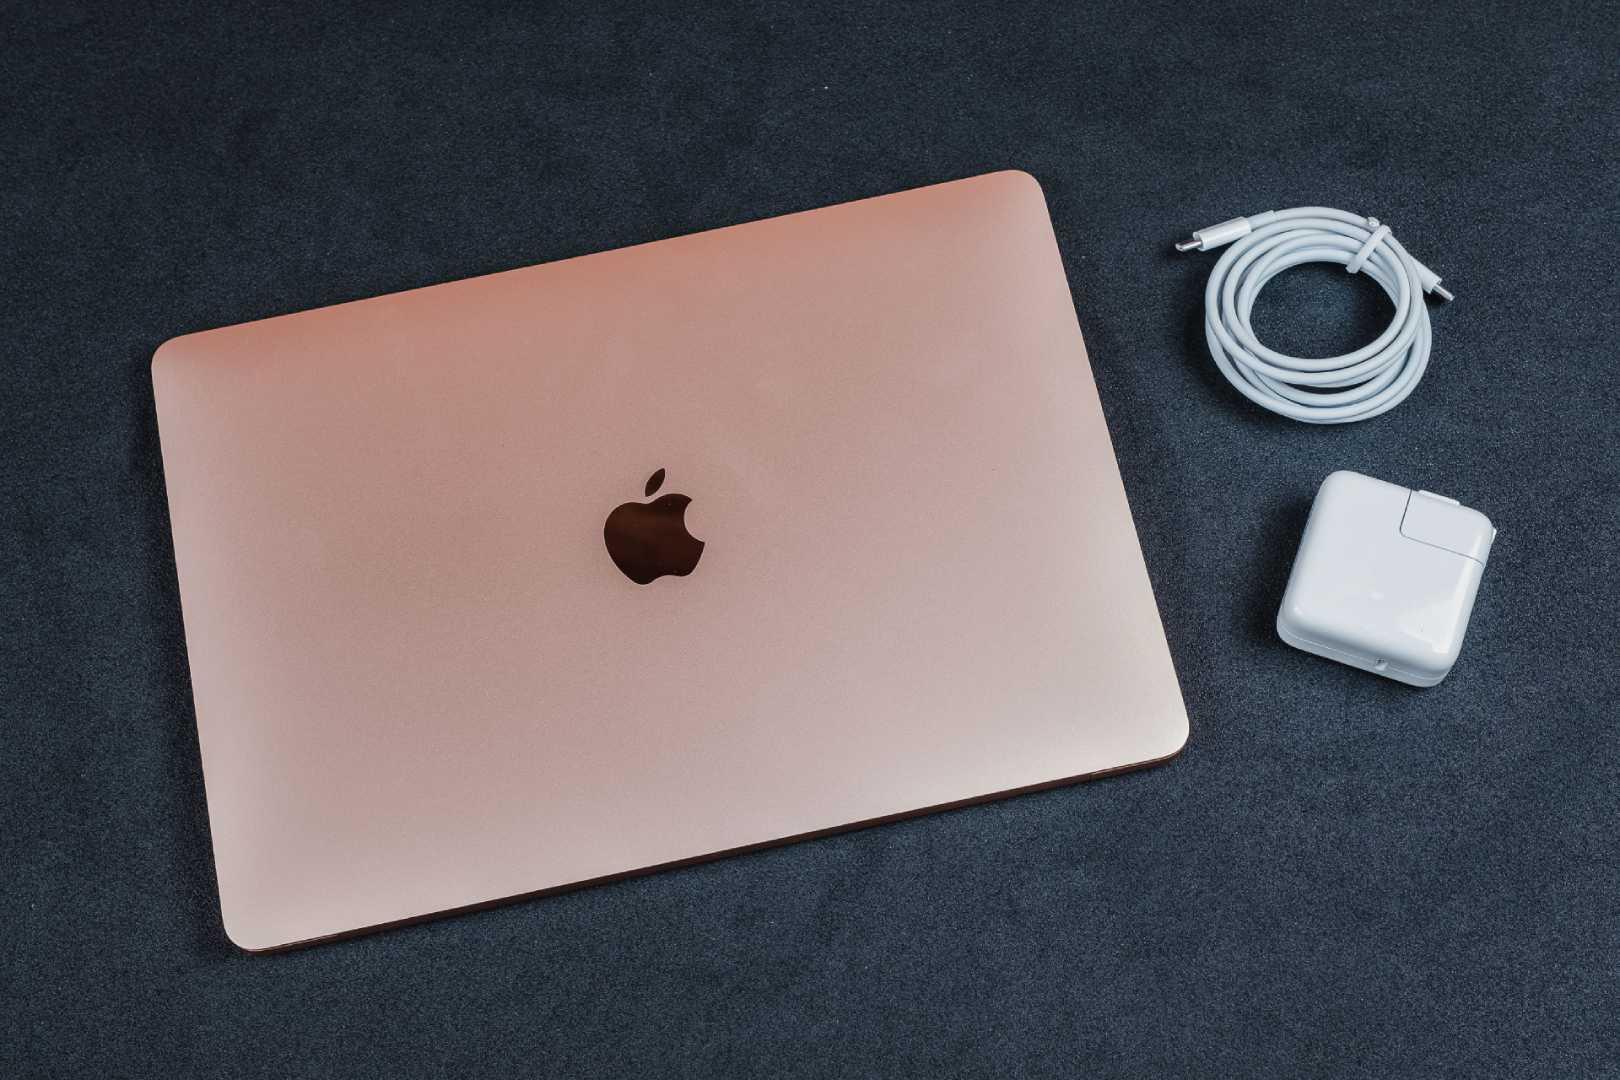 MacBook Air rosa, cabo e carregador sobre mesa preta